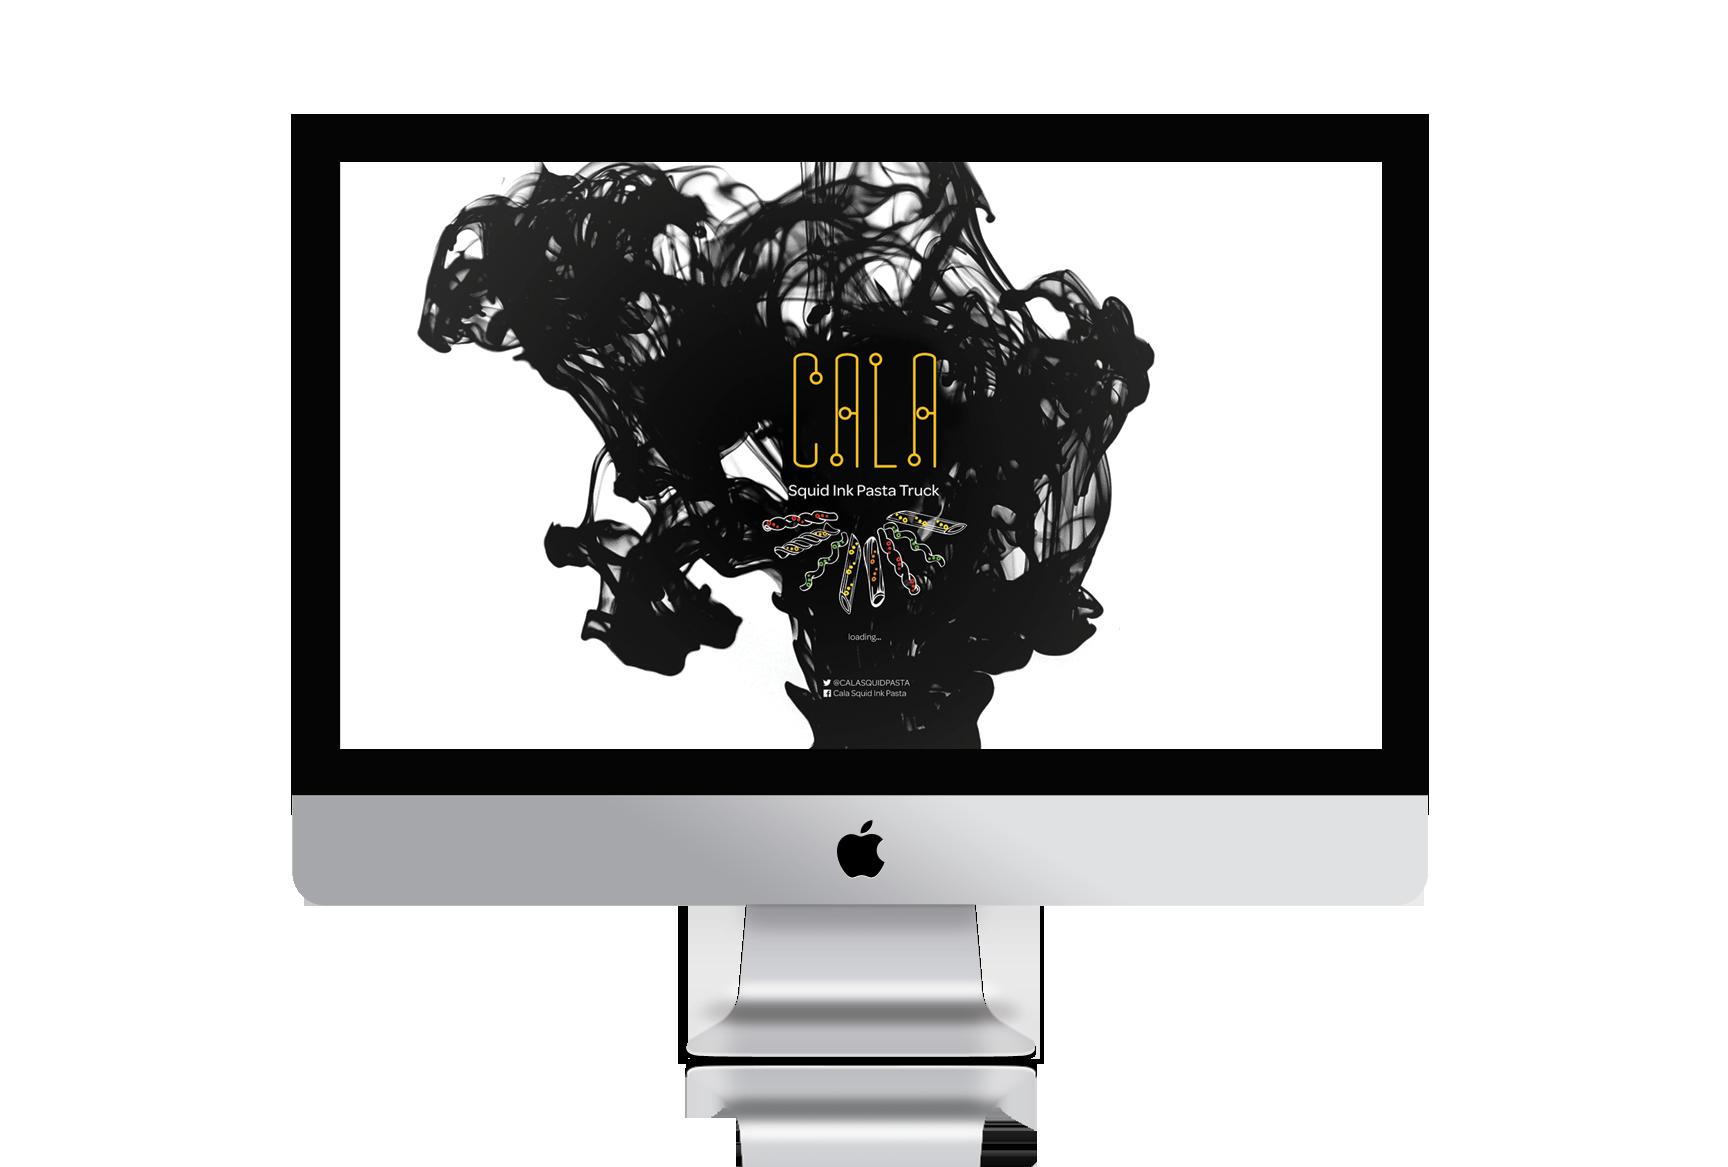 CALA_Front_iMac.png